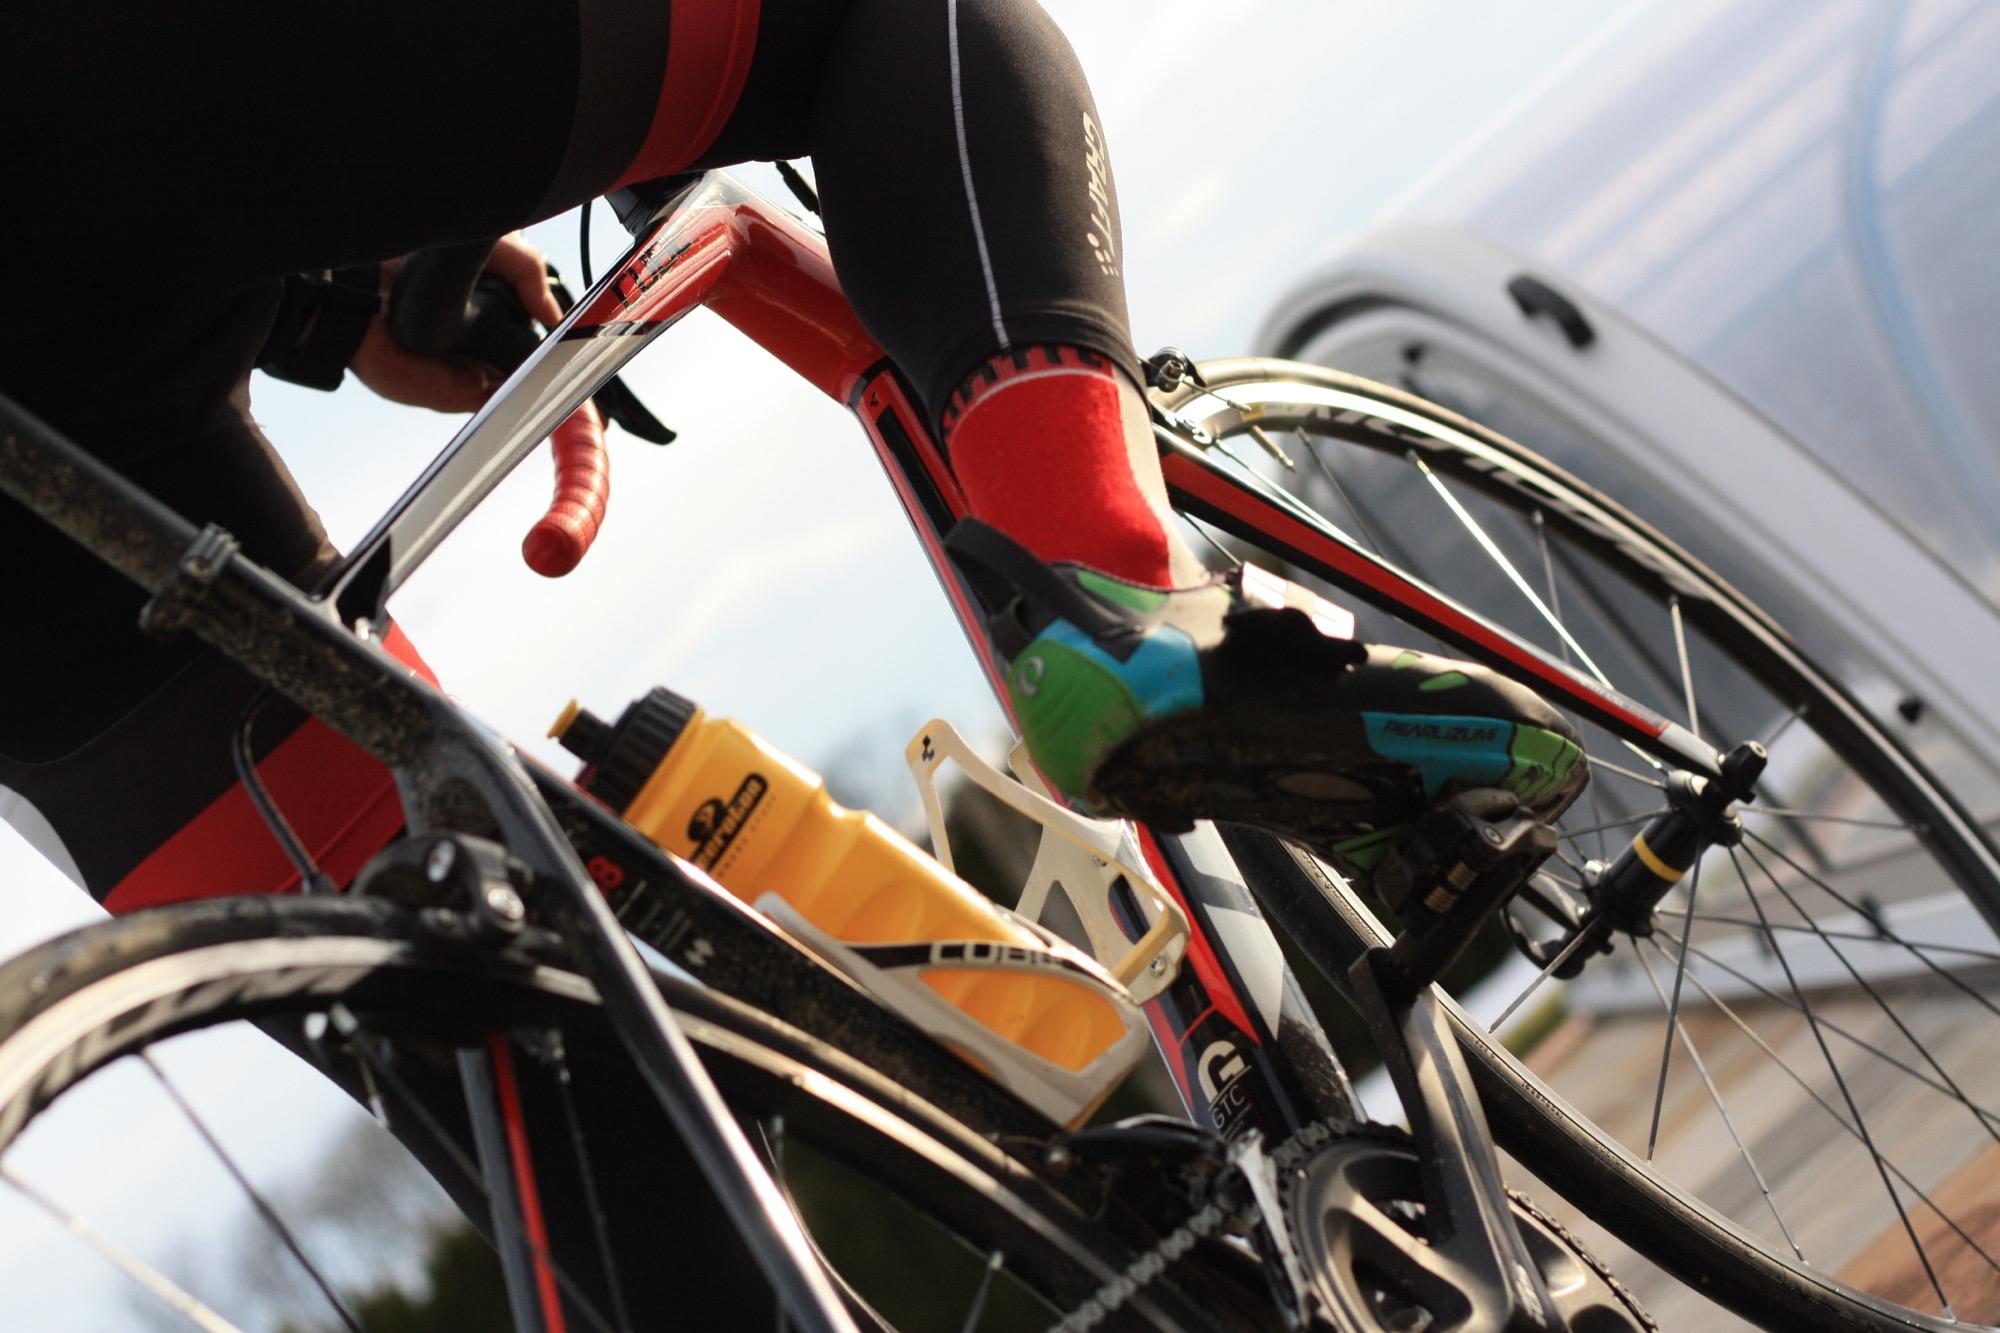 Wiet tri | Die Kirchberger Ironmen